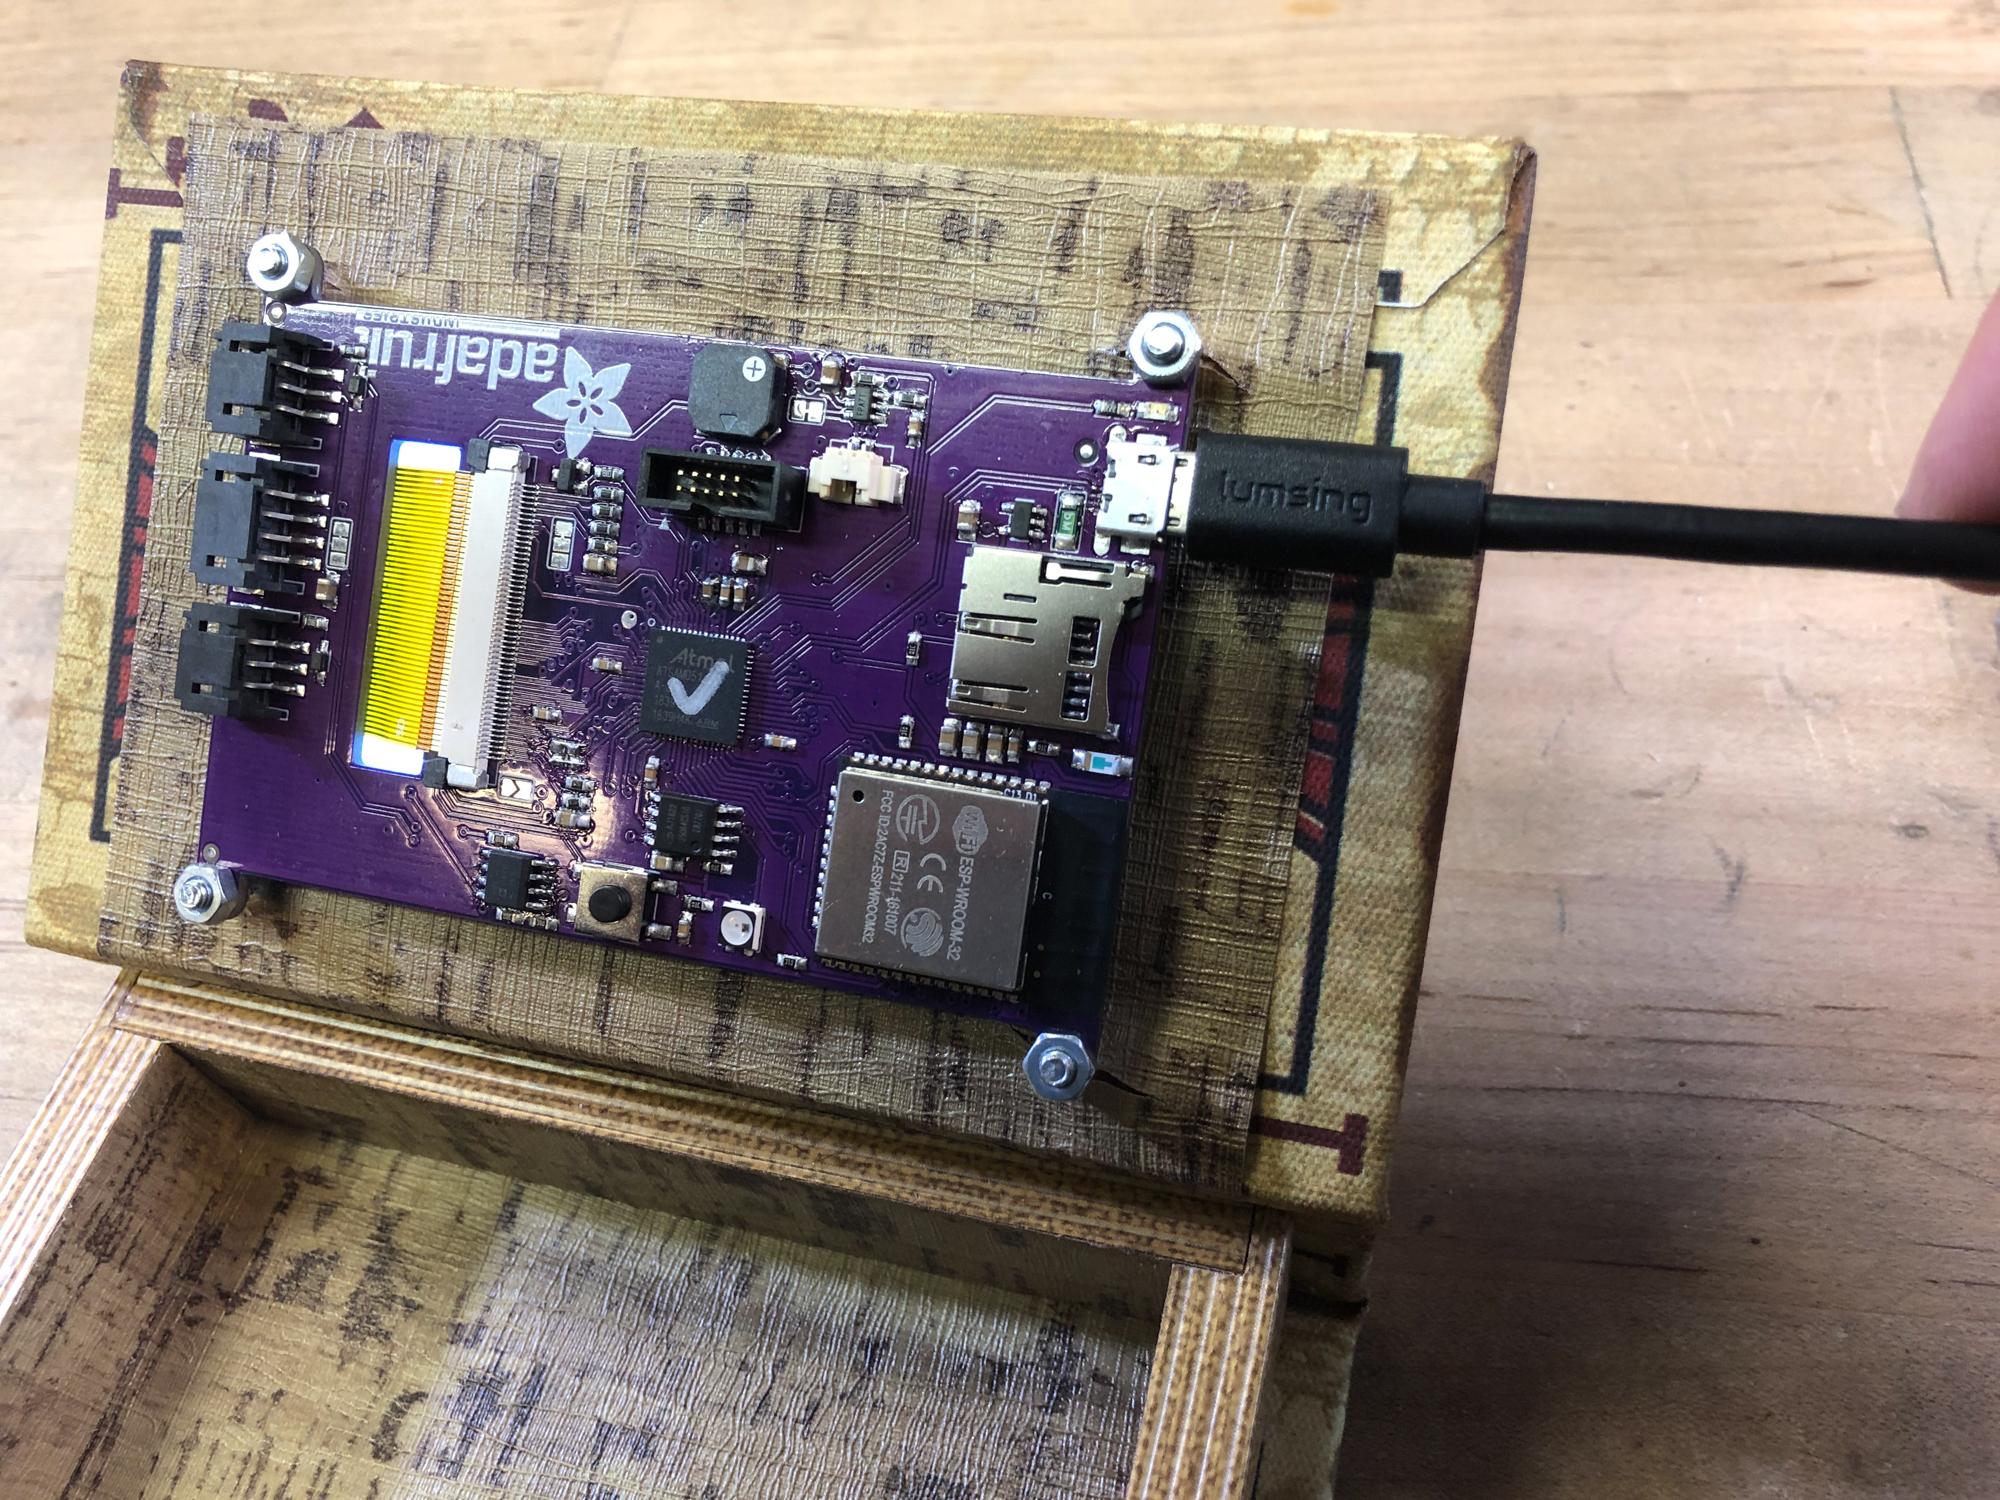 circuitpython_IMG_4223_2k.jpg